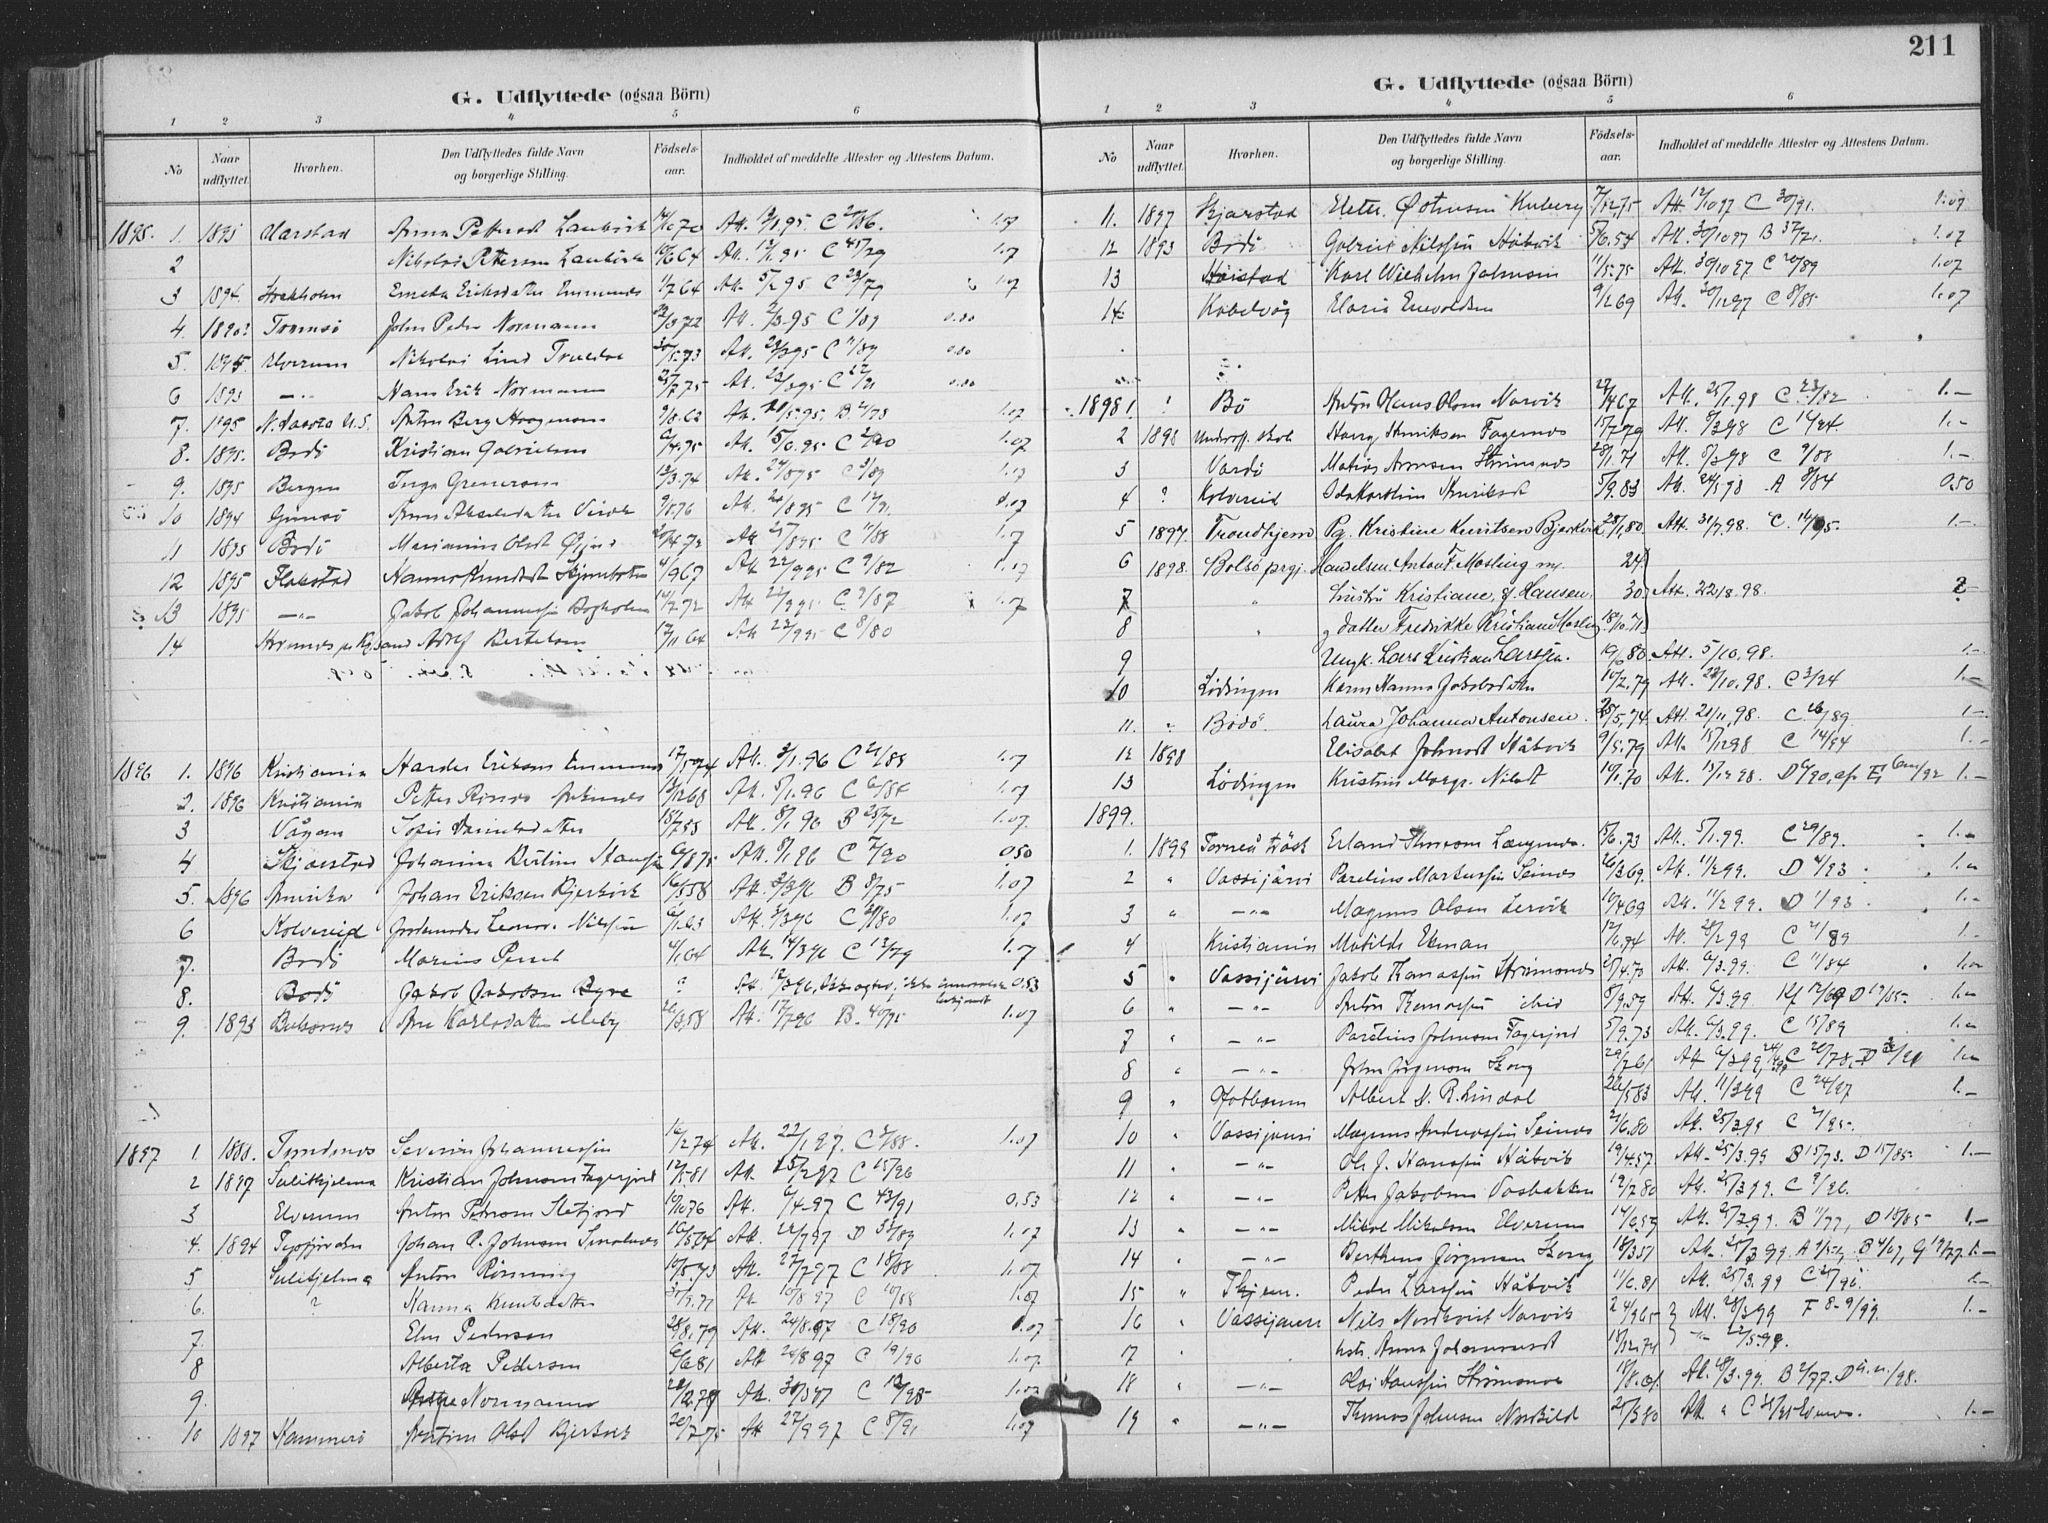 SAT, Ministerialprotokoller, klokkerbøker og fødselsregistre - Nordland, 866/L0939: Ministerialbok nr. 866A02, 1894-1906, s. 211